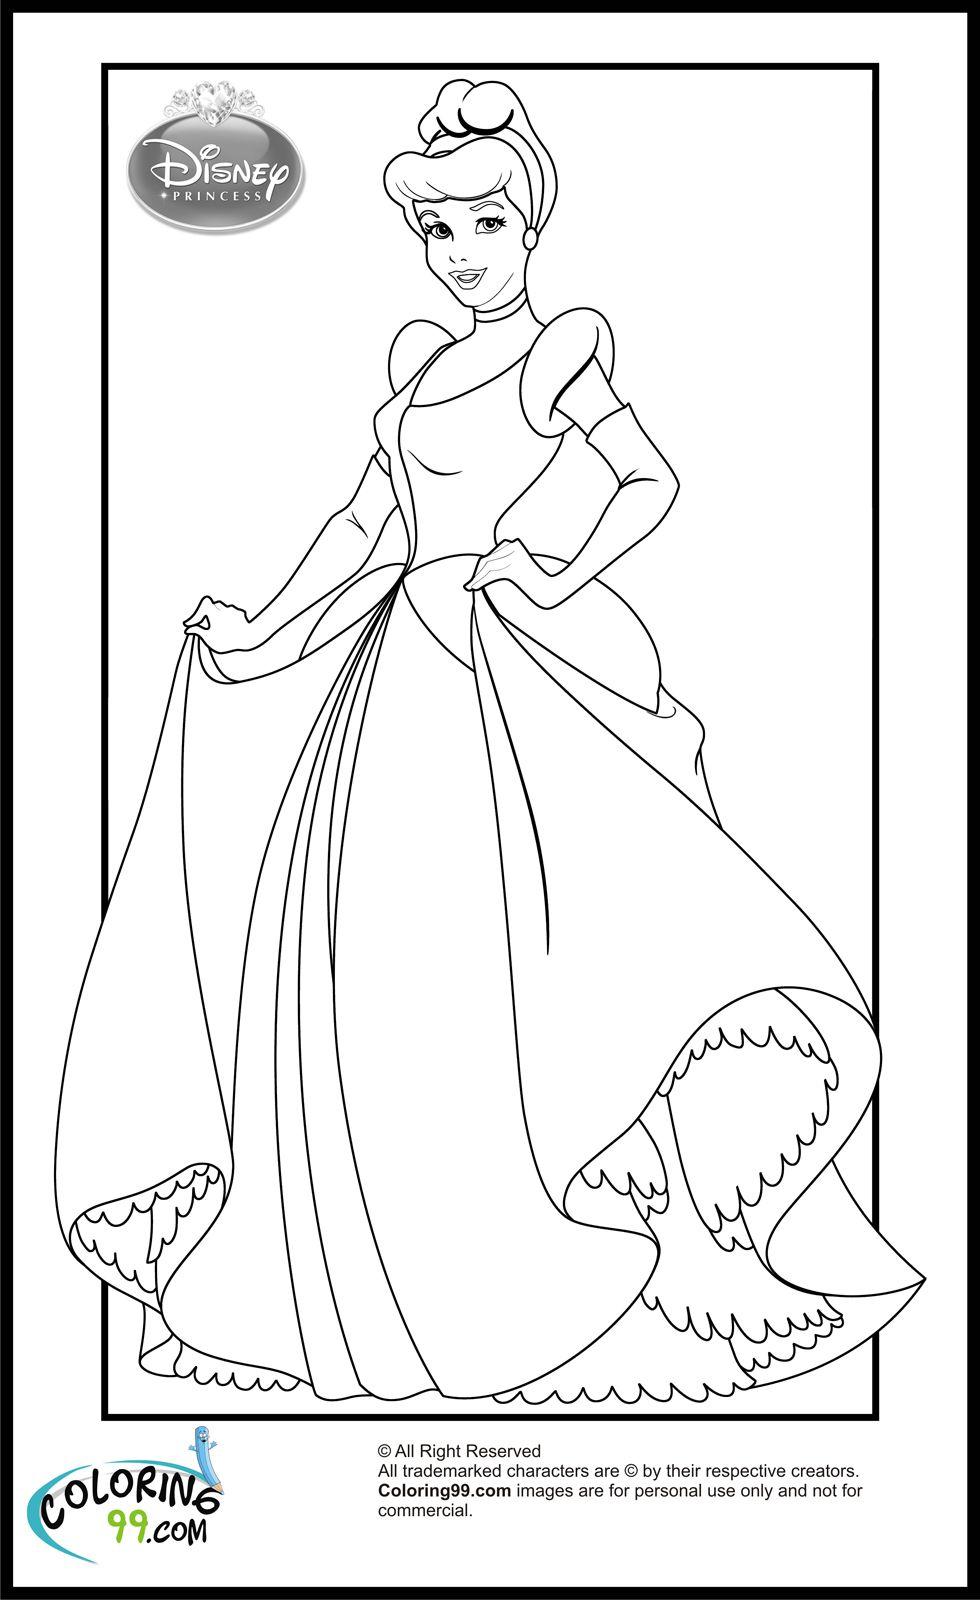 disney princess cinderella coloring pages | Coloring Pages ...